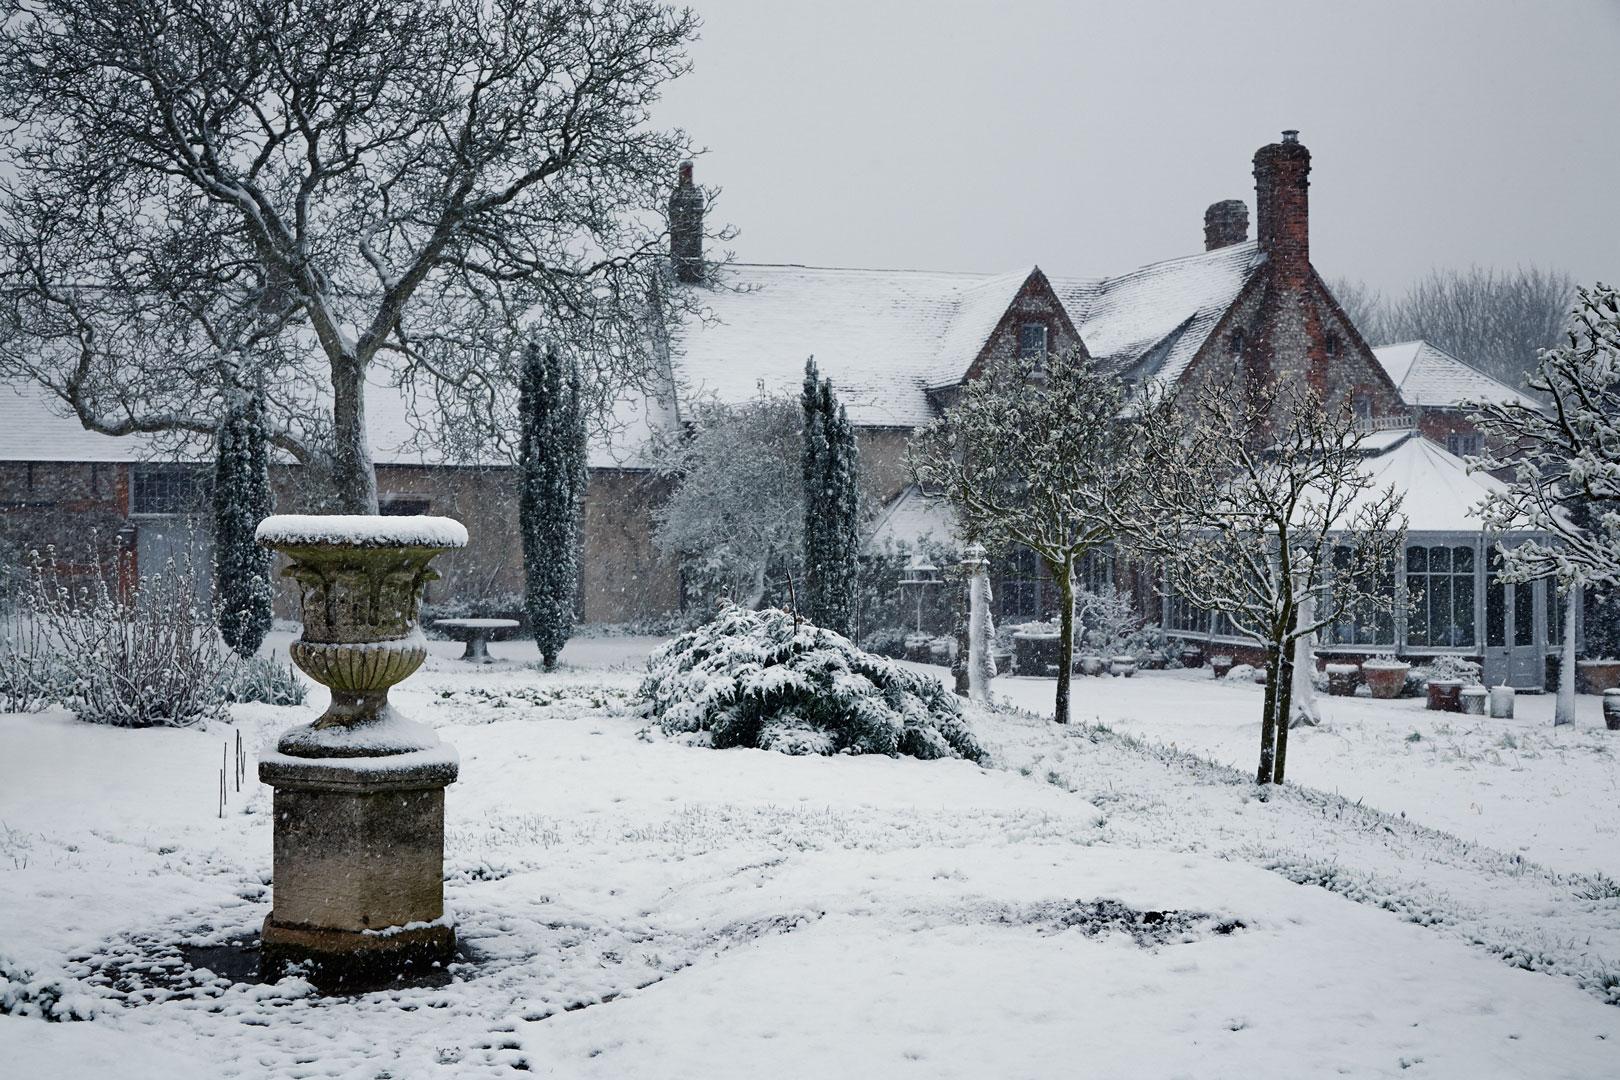 Upper Farm, Wiltshire